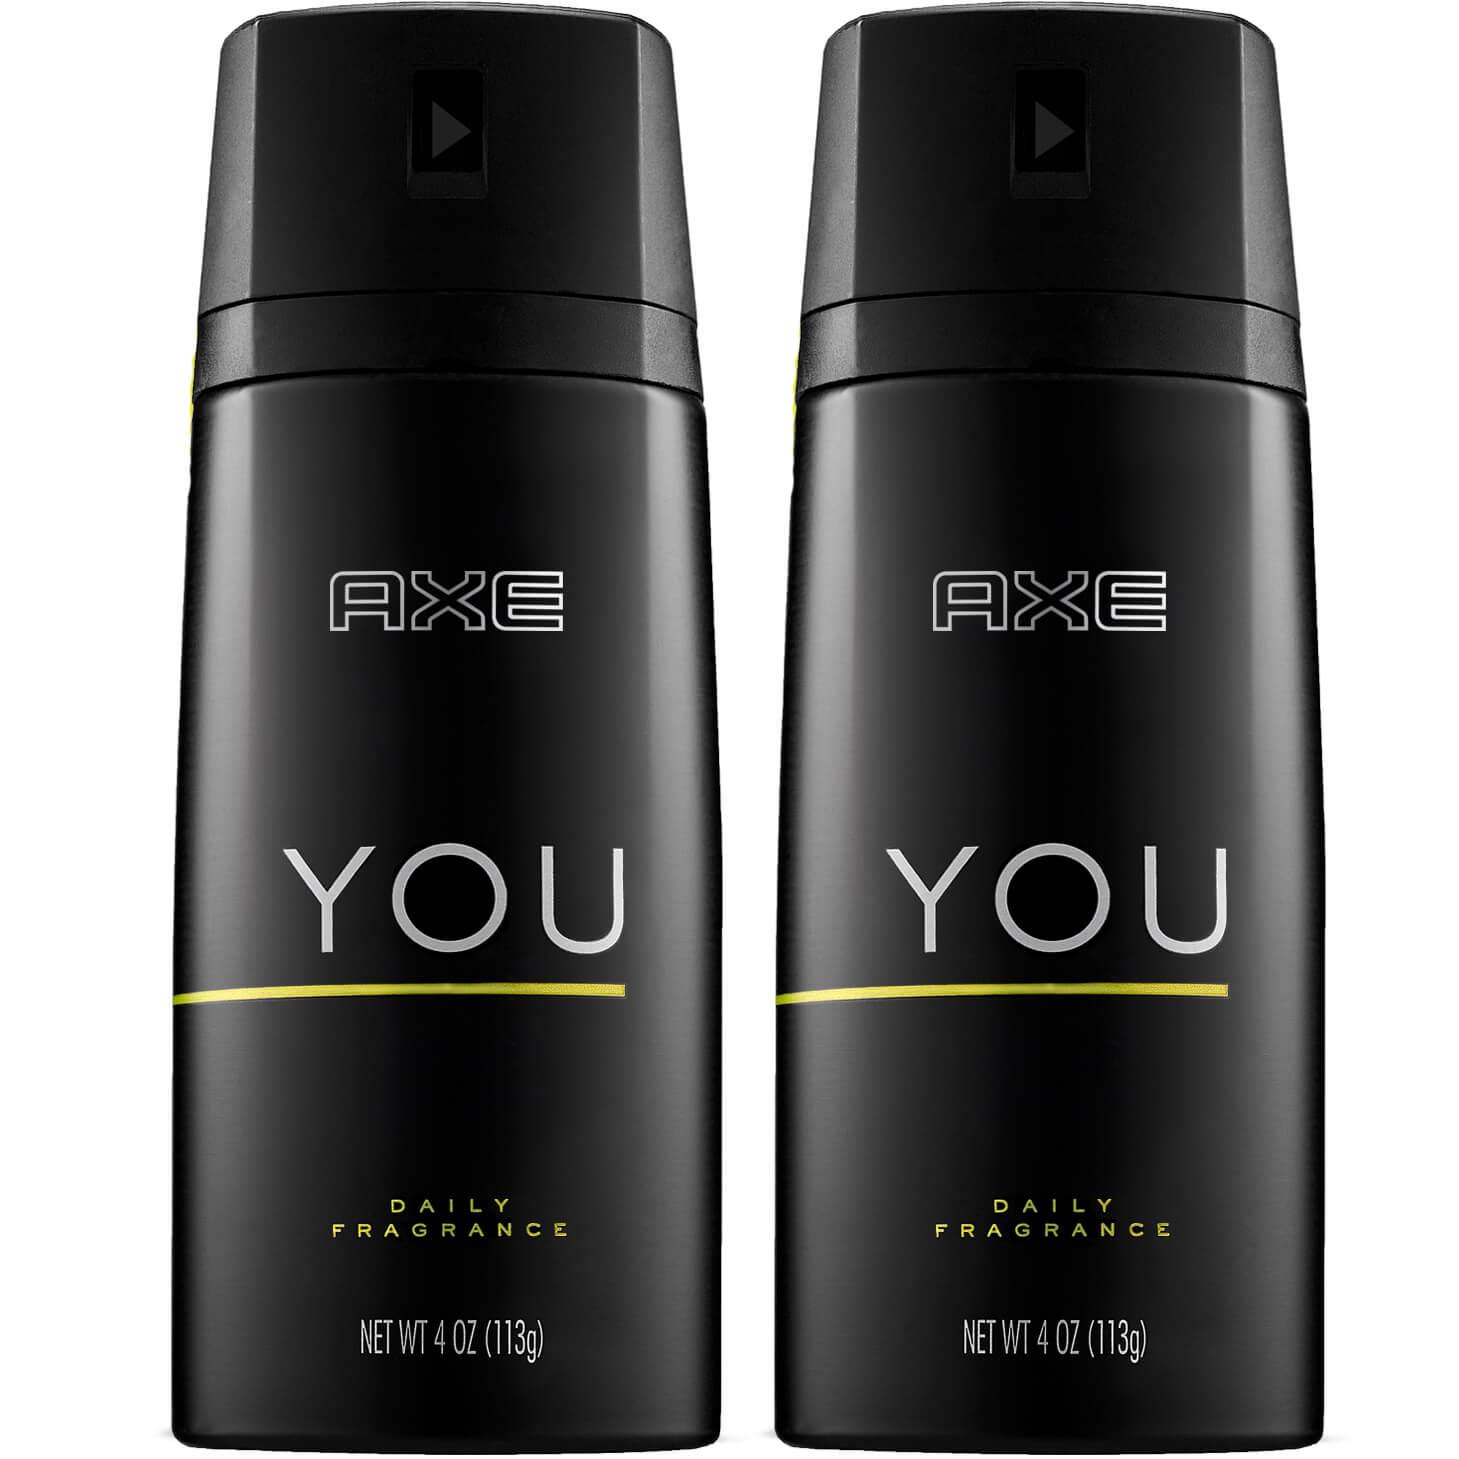 Axe Πακέτο Προσφοράς You Body Spray Αποσμητικό για Αίσθηση Φρεσκάδας και Αυτοπεποίθησης 2x150ml 1+1 Δώρο